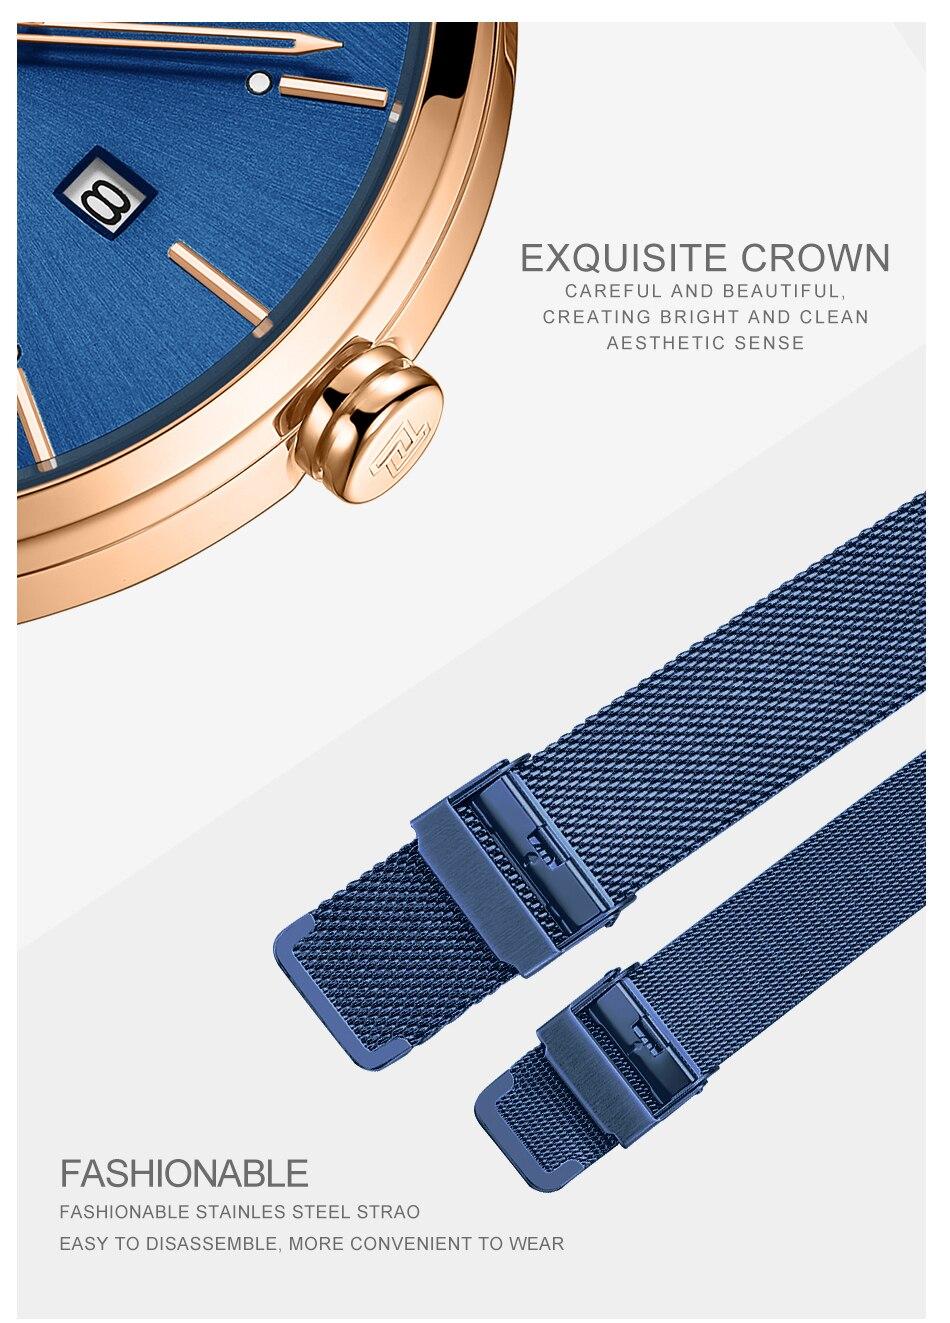 NAVIFORCE New Stylish Women Watches Top Brand Luxury Stainless Steel Strap Quartz Wristwatch For Woman Bracelet Watch 2019 Gift (11)